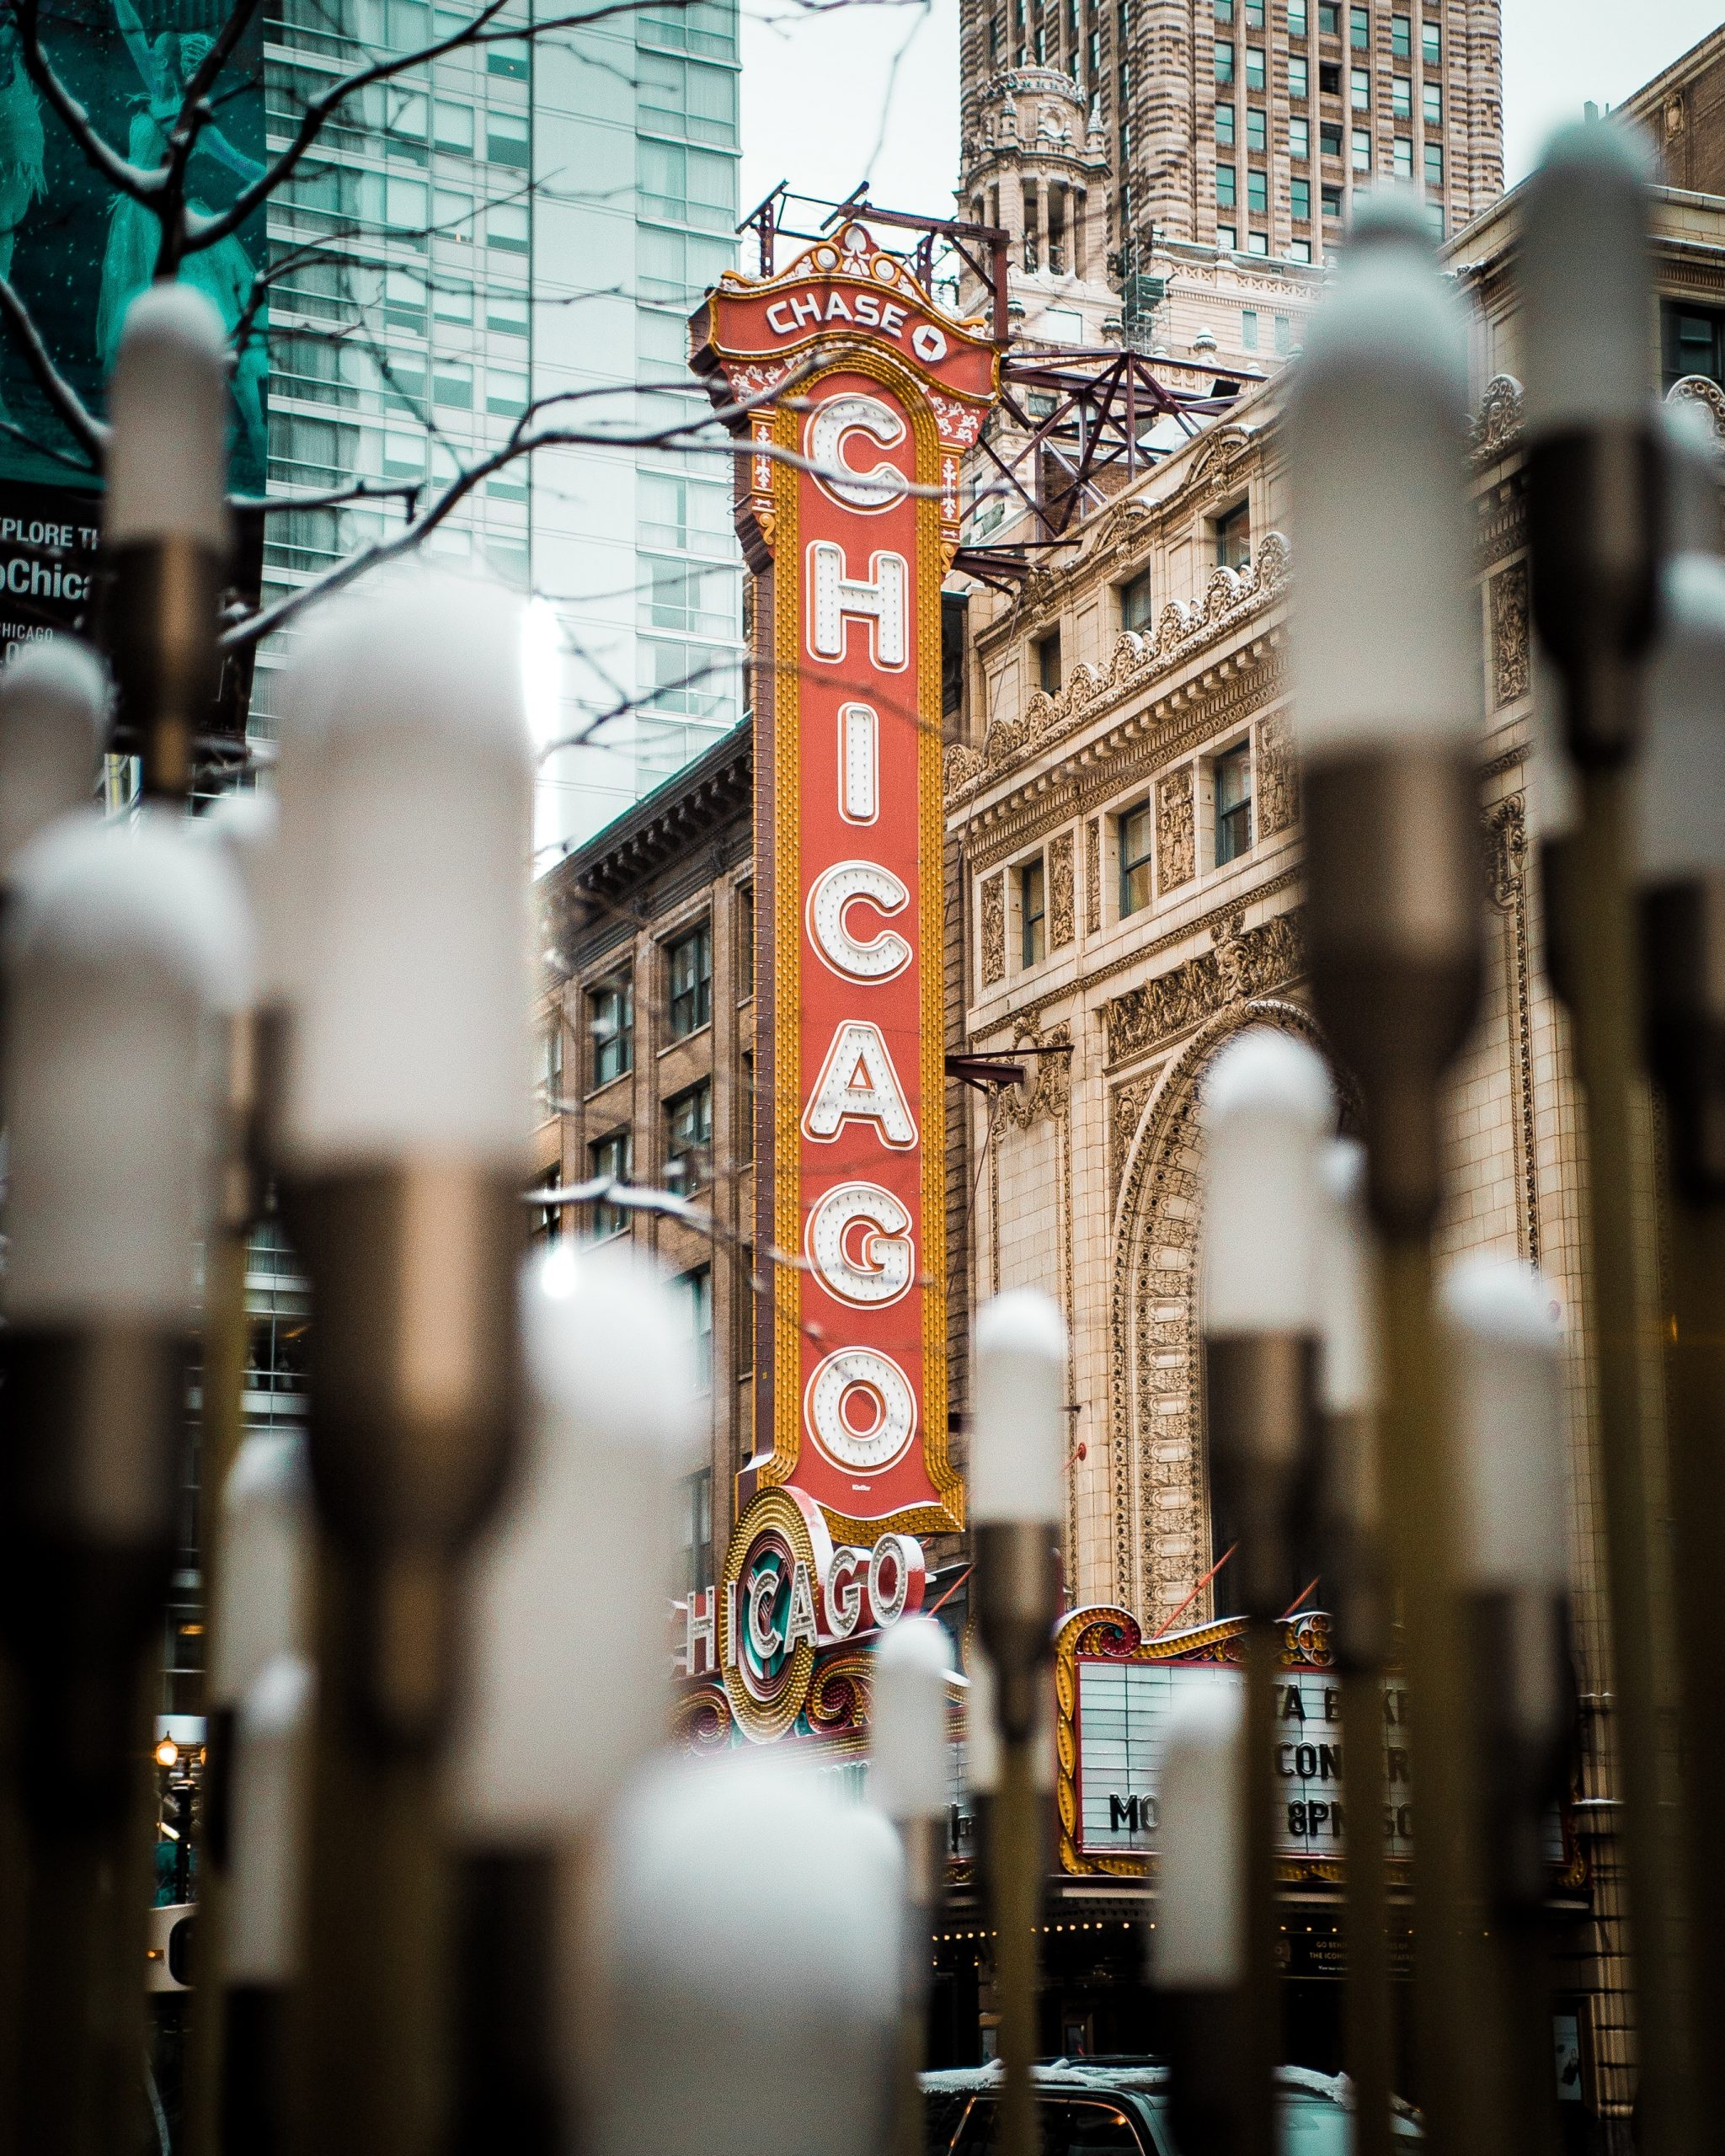 chicago-neon-sign-signage-1769298-1